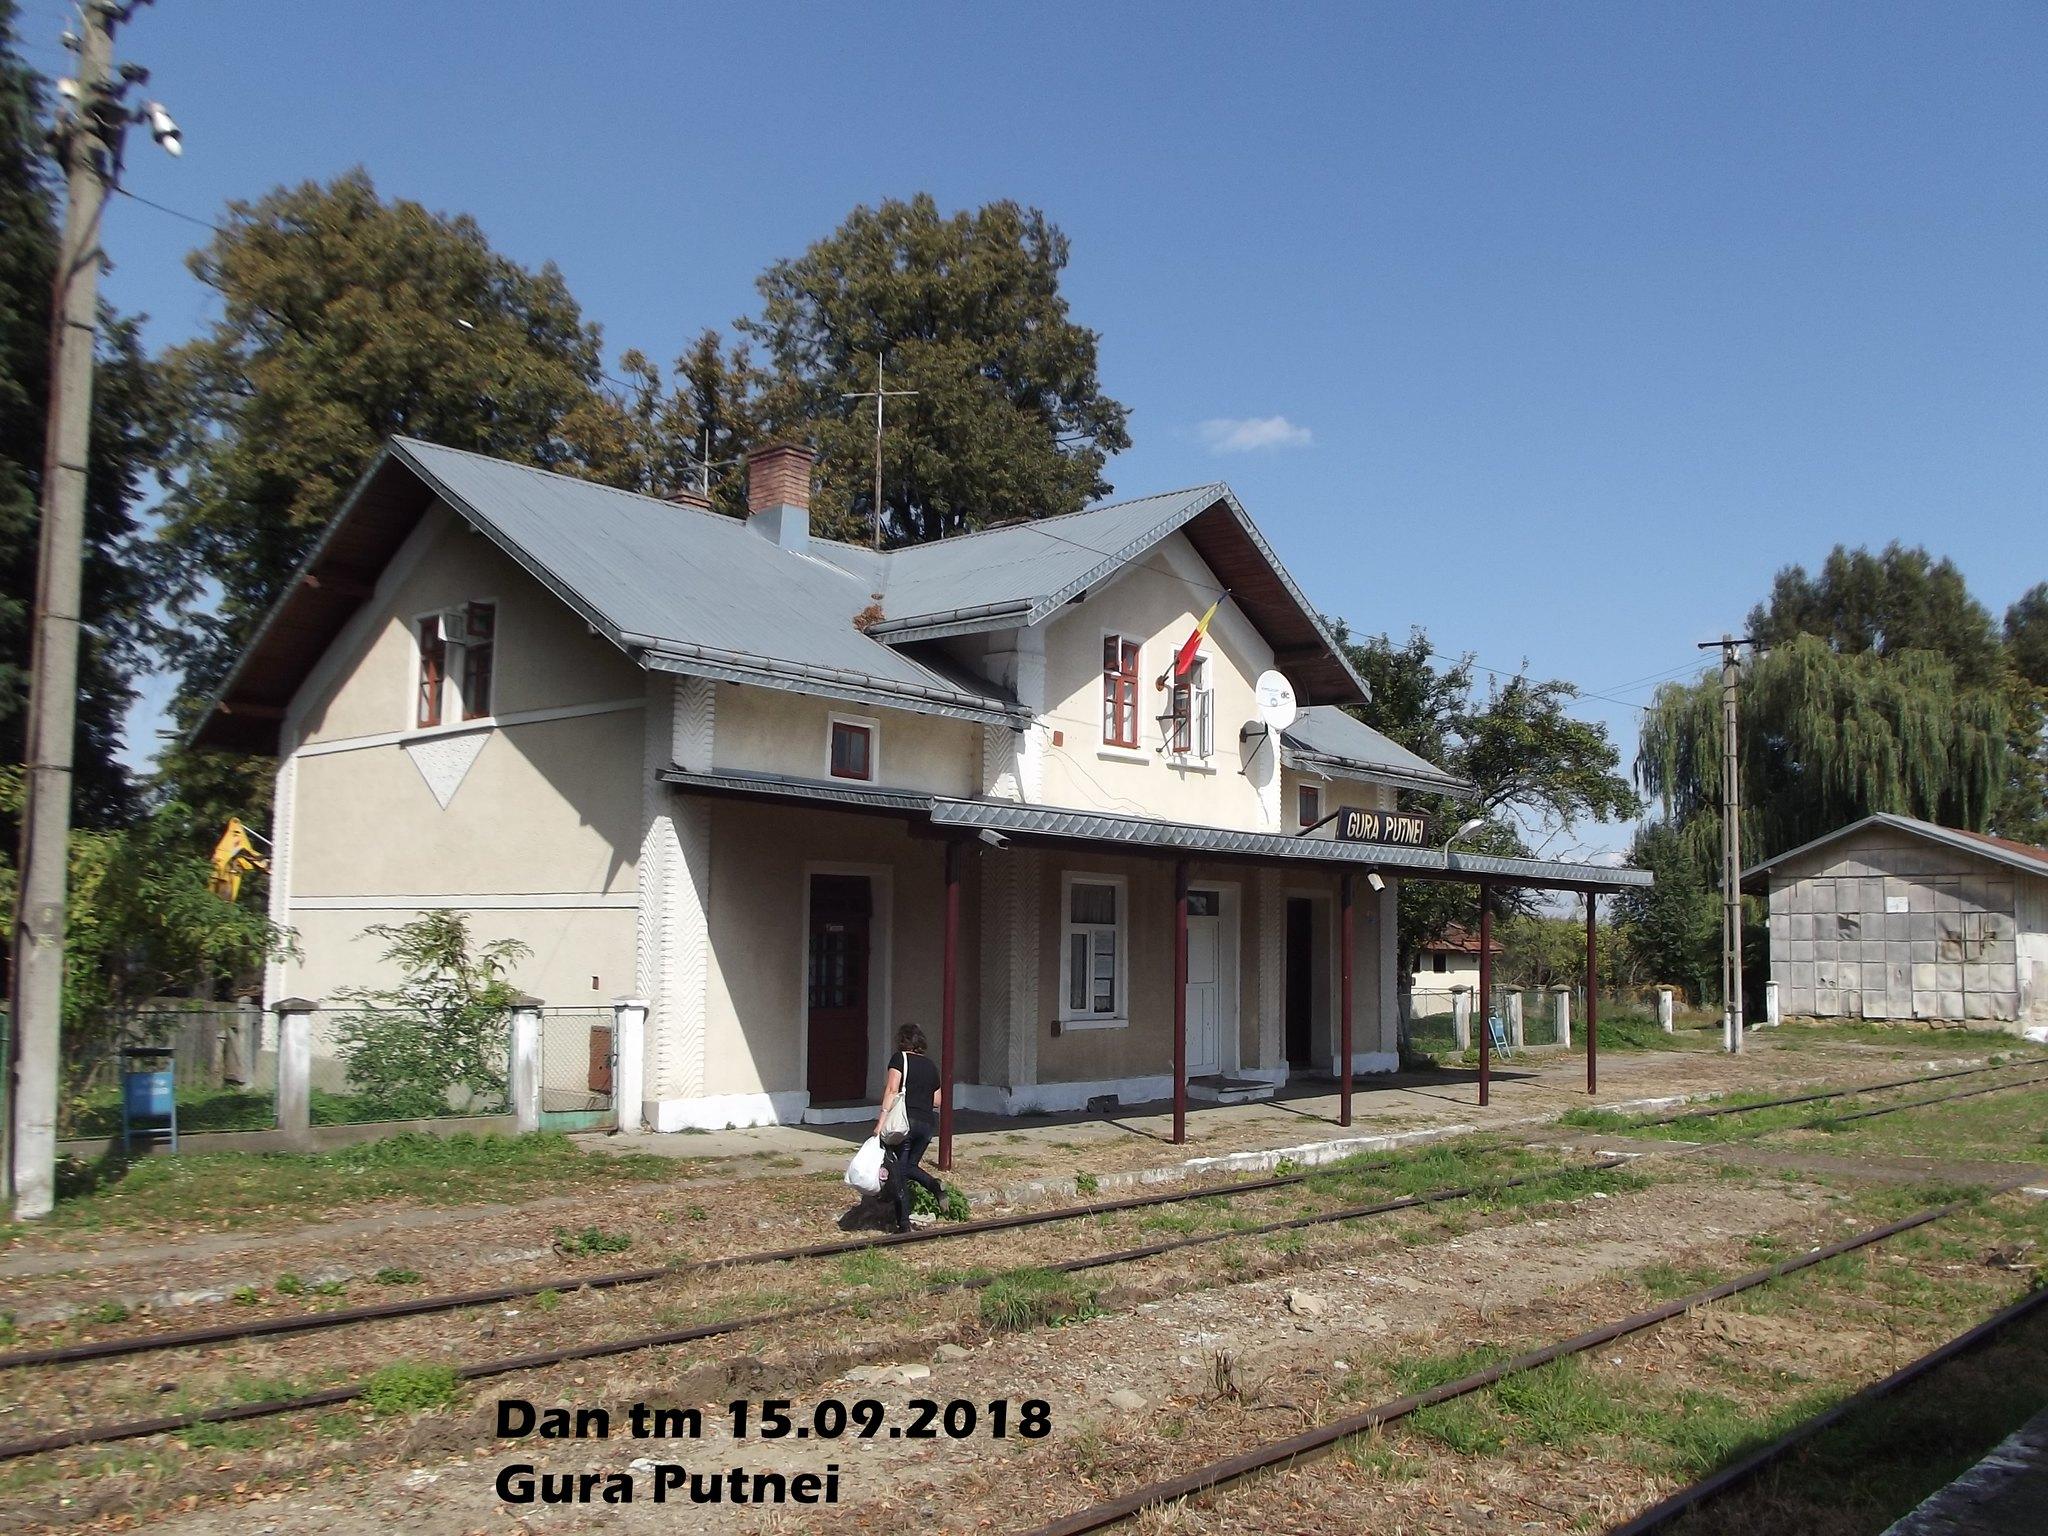 515 : Dorneşti - Gura Putnei - (Putna) - Nisipitu - Seletin UKR - Pagina 47 44016740264_d9f868bdbd_k